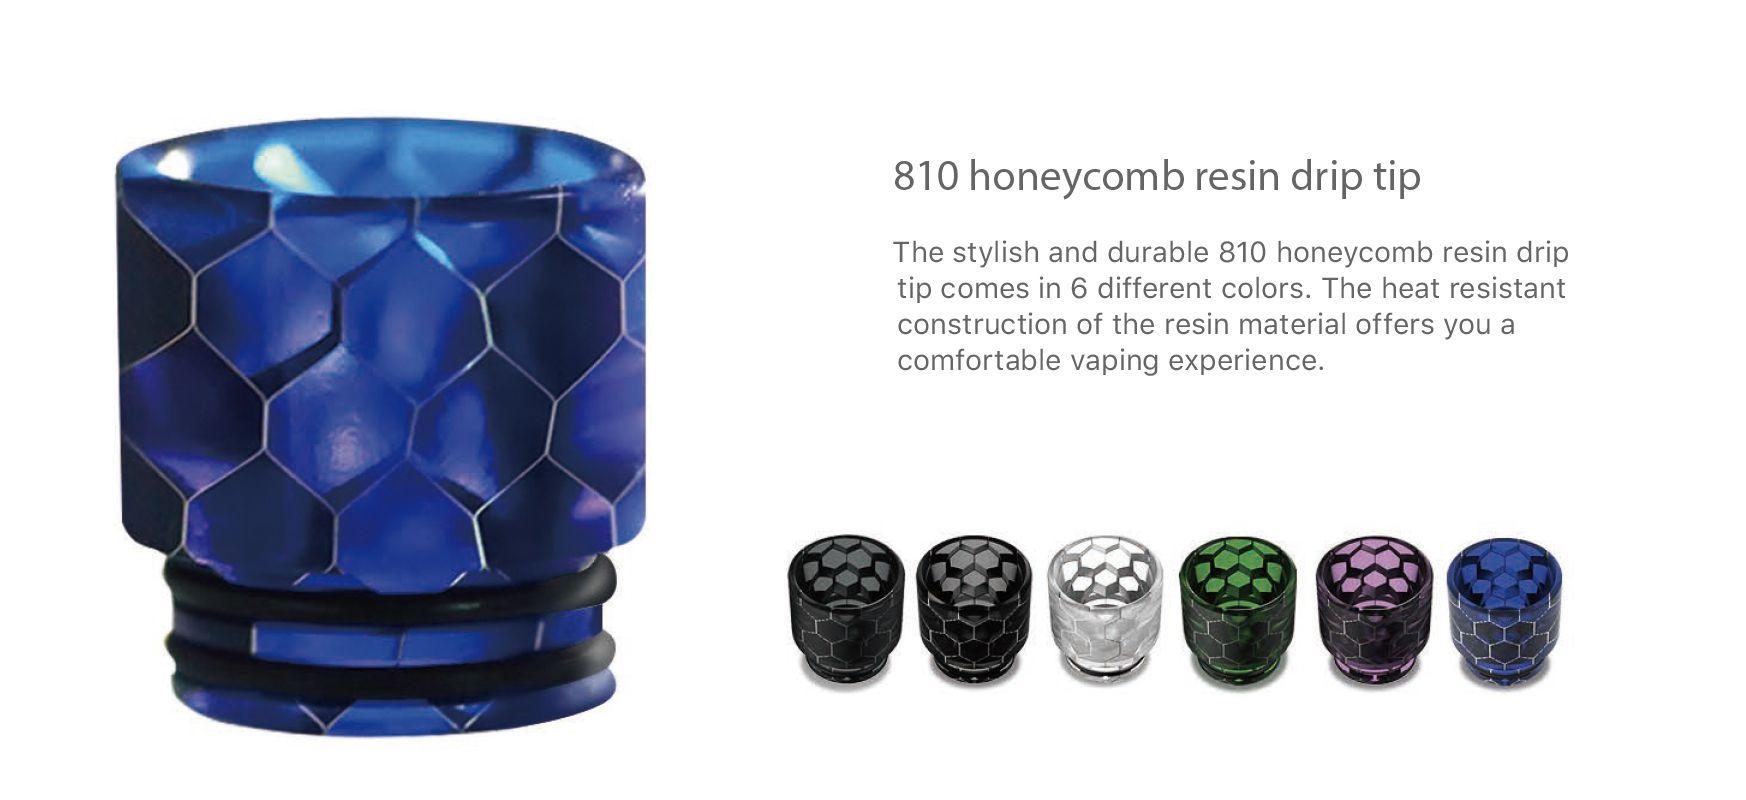 Aspire Odan tank honeycomb 810 drip tip